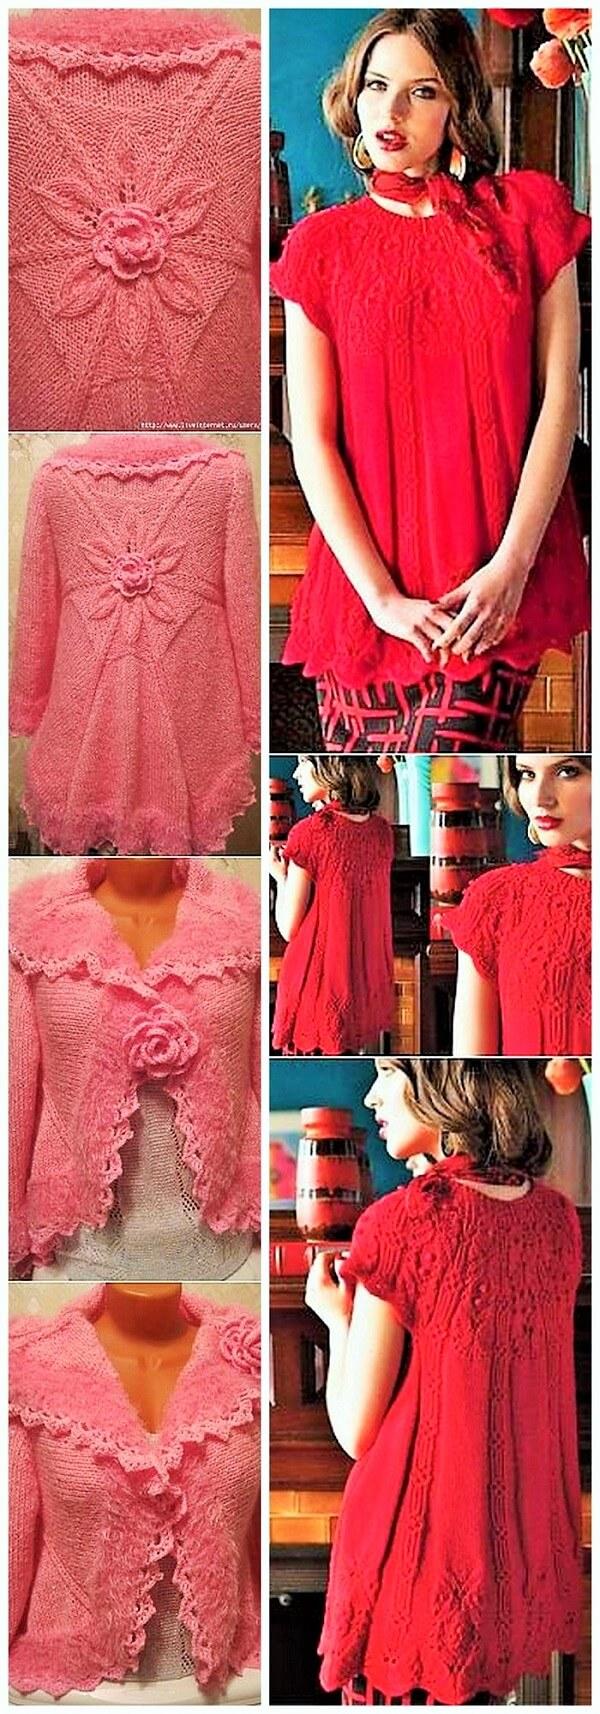 homemade with crochet Ladies Fashion Ideas -6